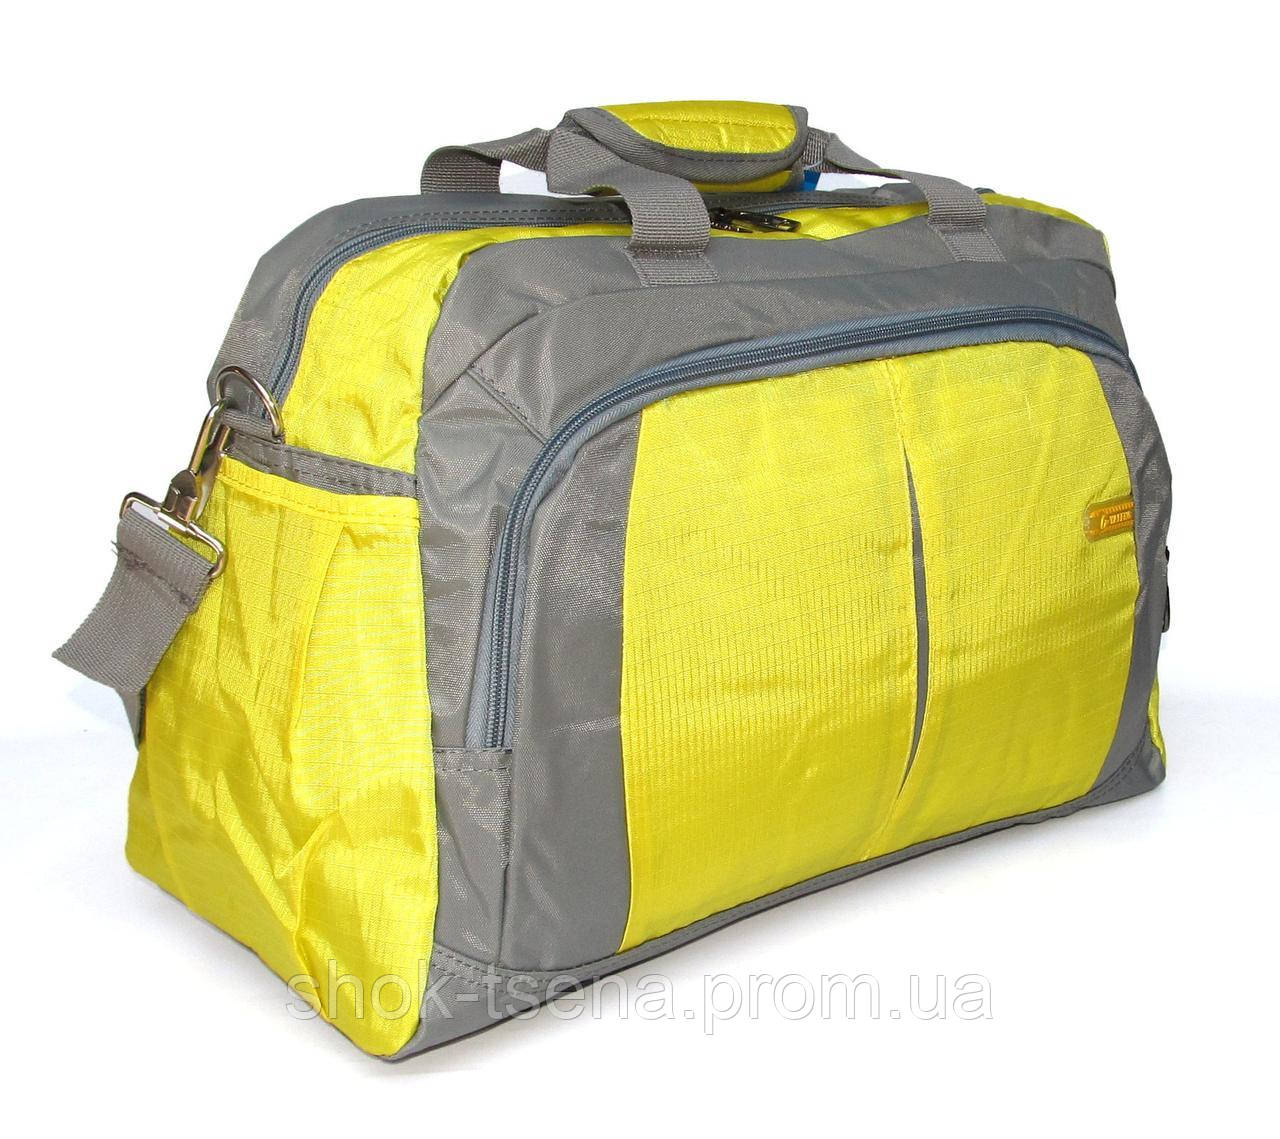 Yafeng рюкзаки заказать рюкзак manchester united